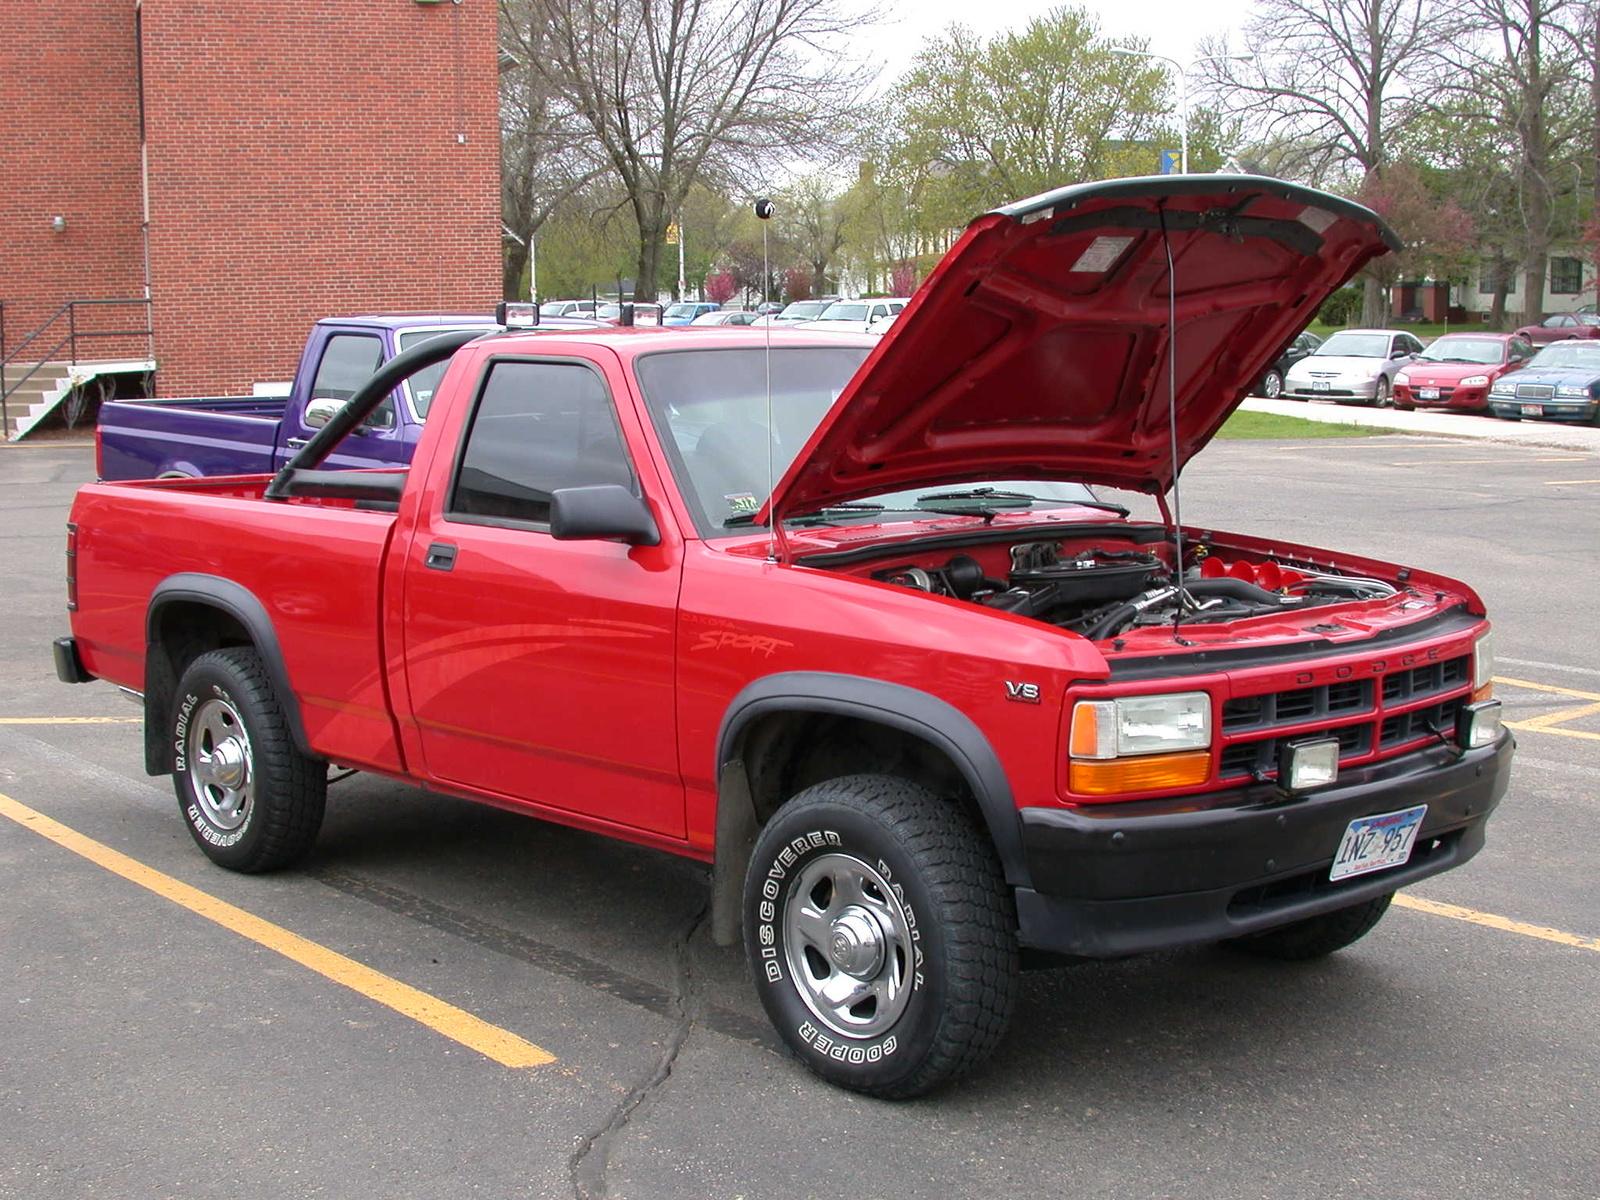 Used Toyota Tacoma For Sale Cargurus >> 1996 Dodge Dakota - Other Pictures - CarGurus